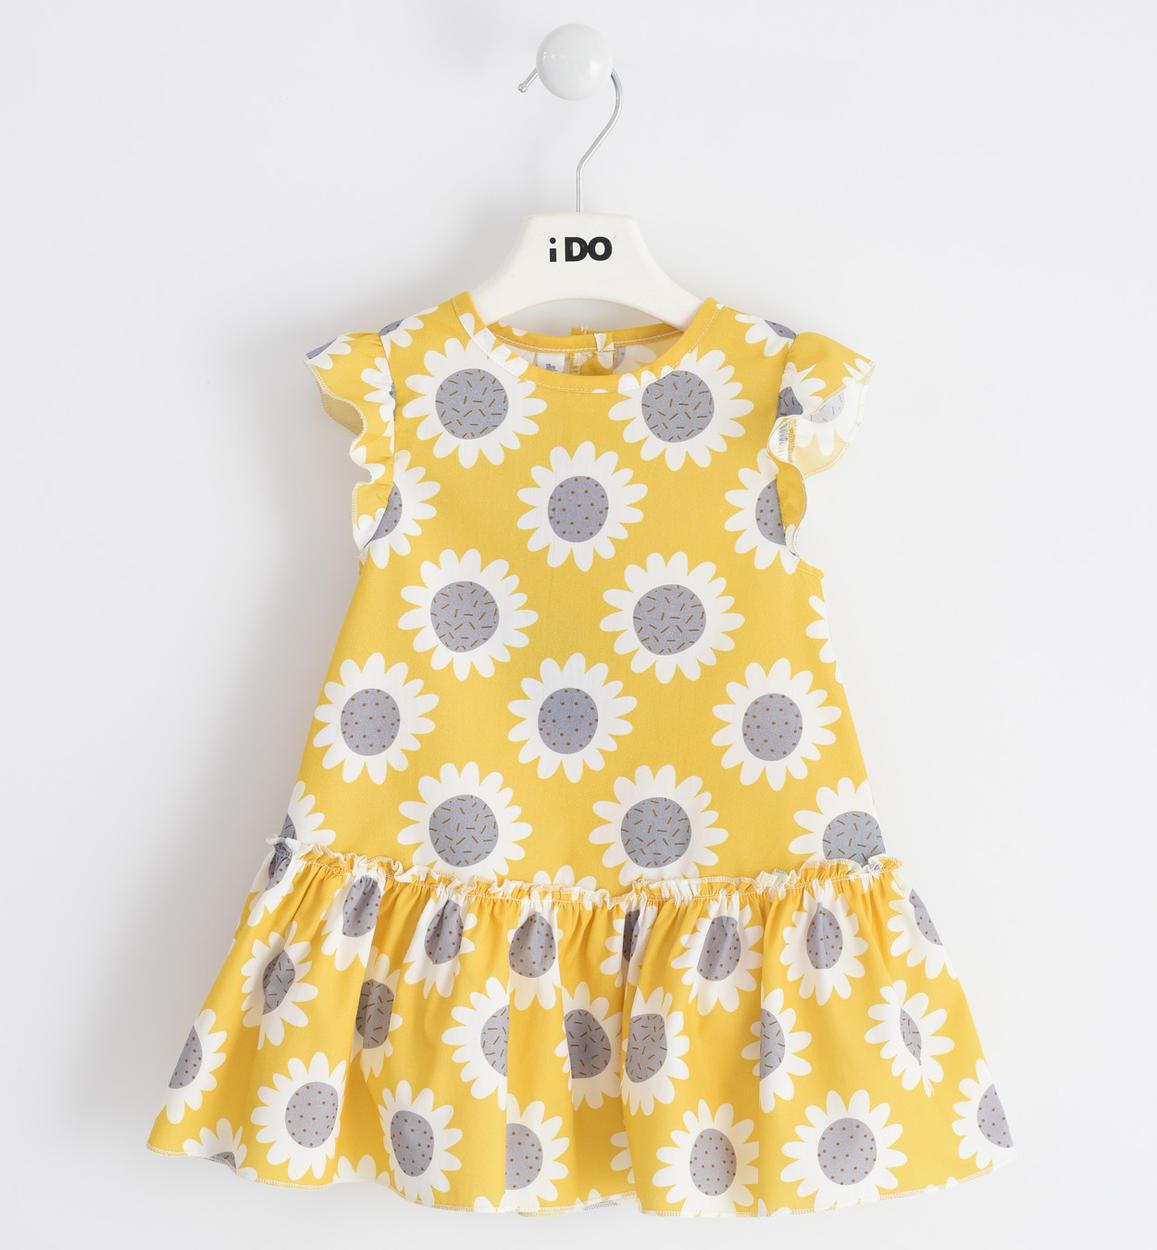 Sárga pamut virágos ruha